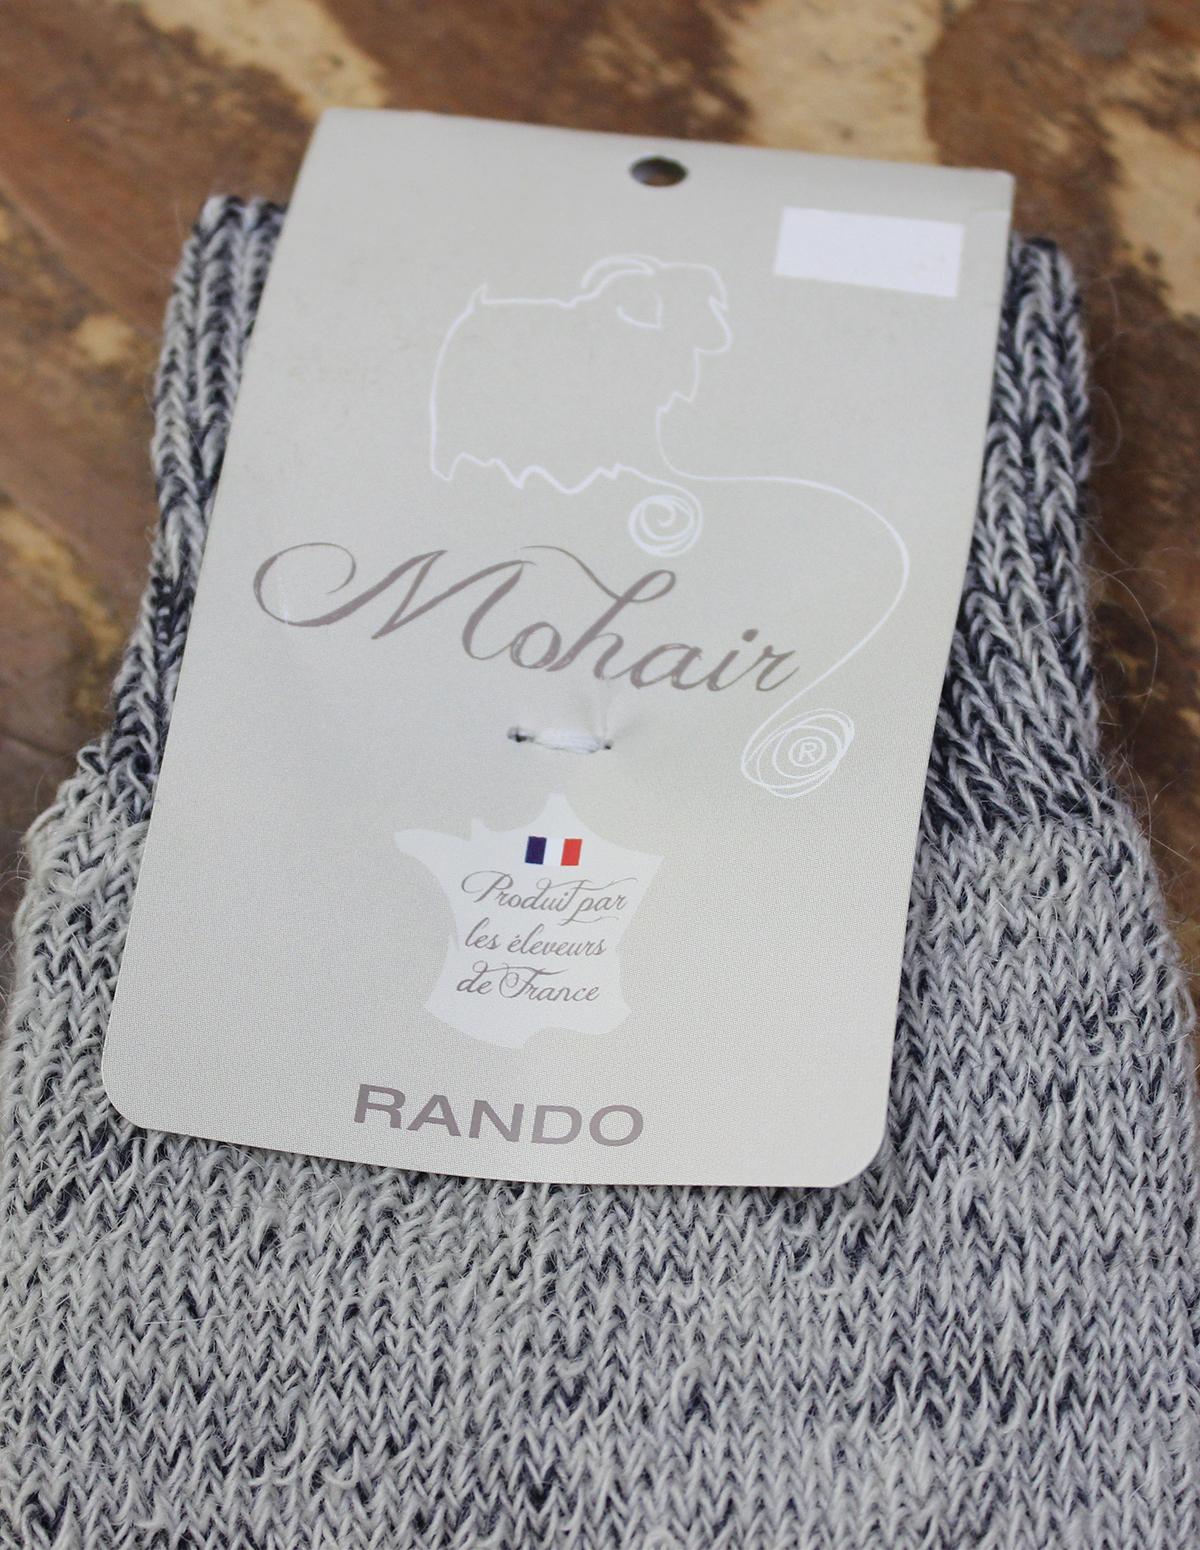 Chaussettes-Rando-Chine-Ecru-1-Une-Ferme-a-la-Bassette